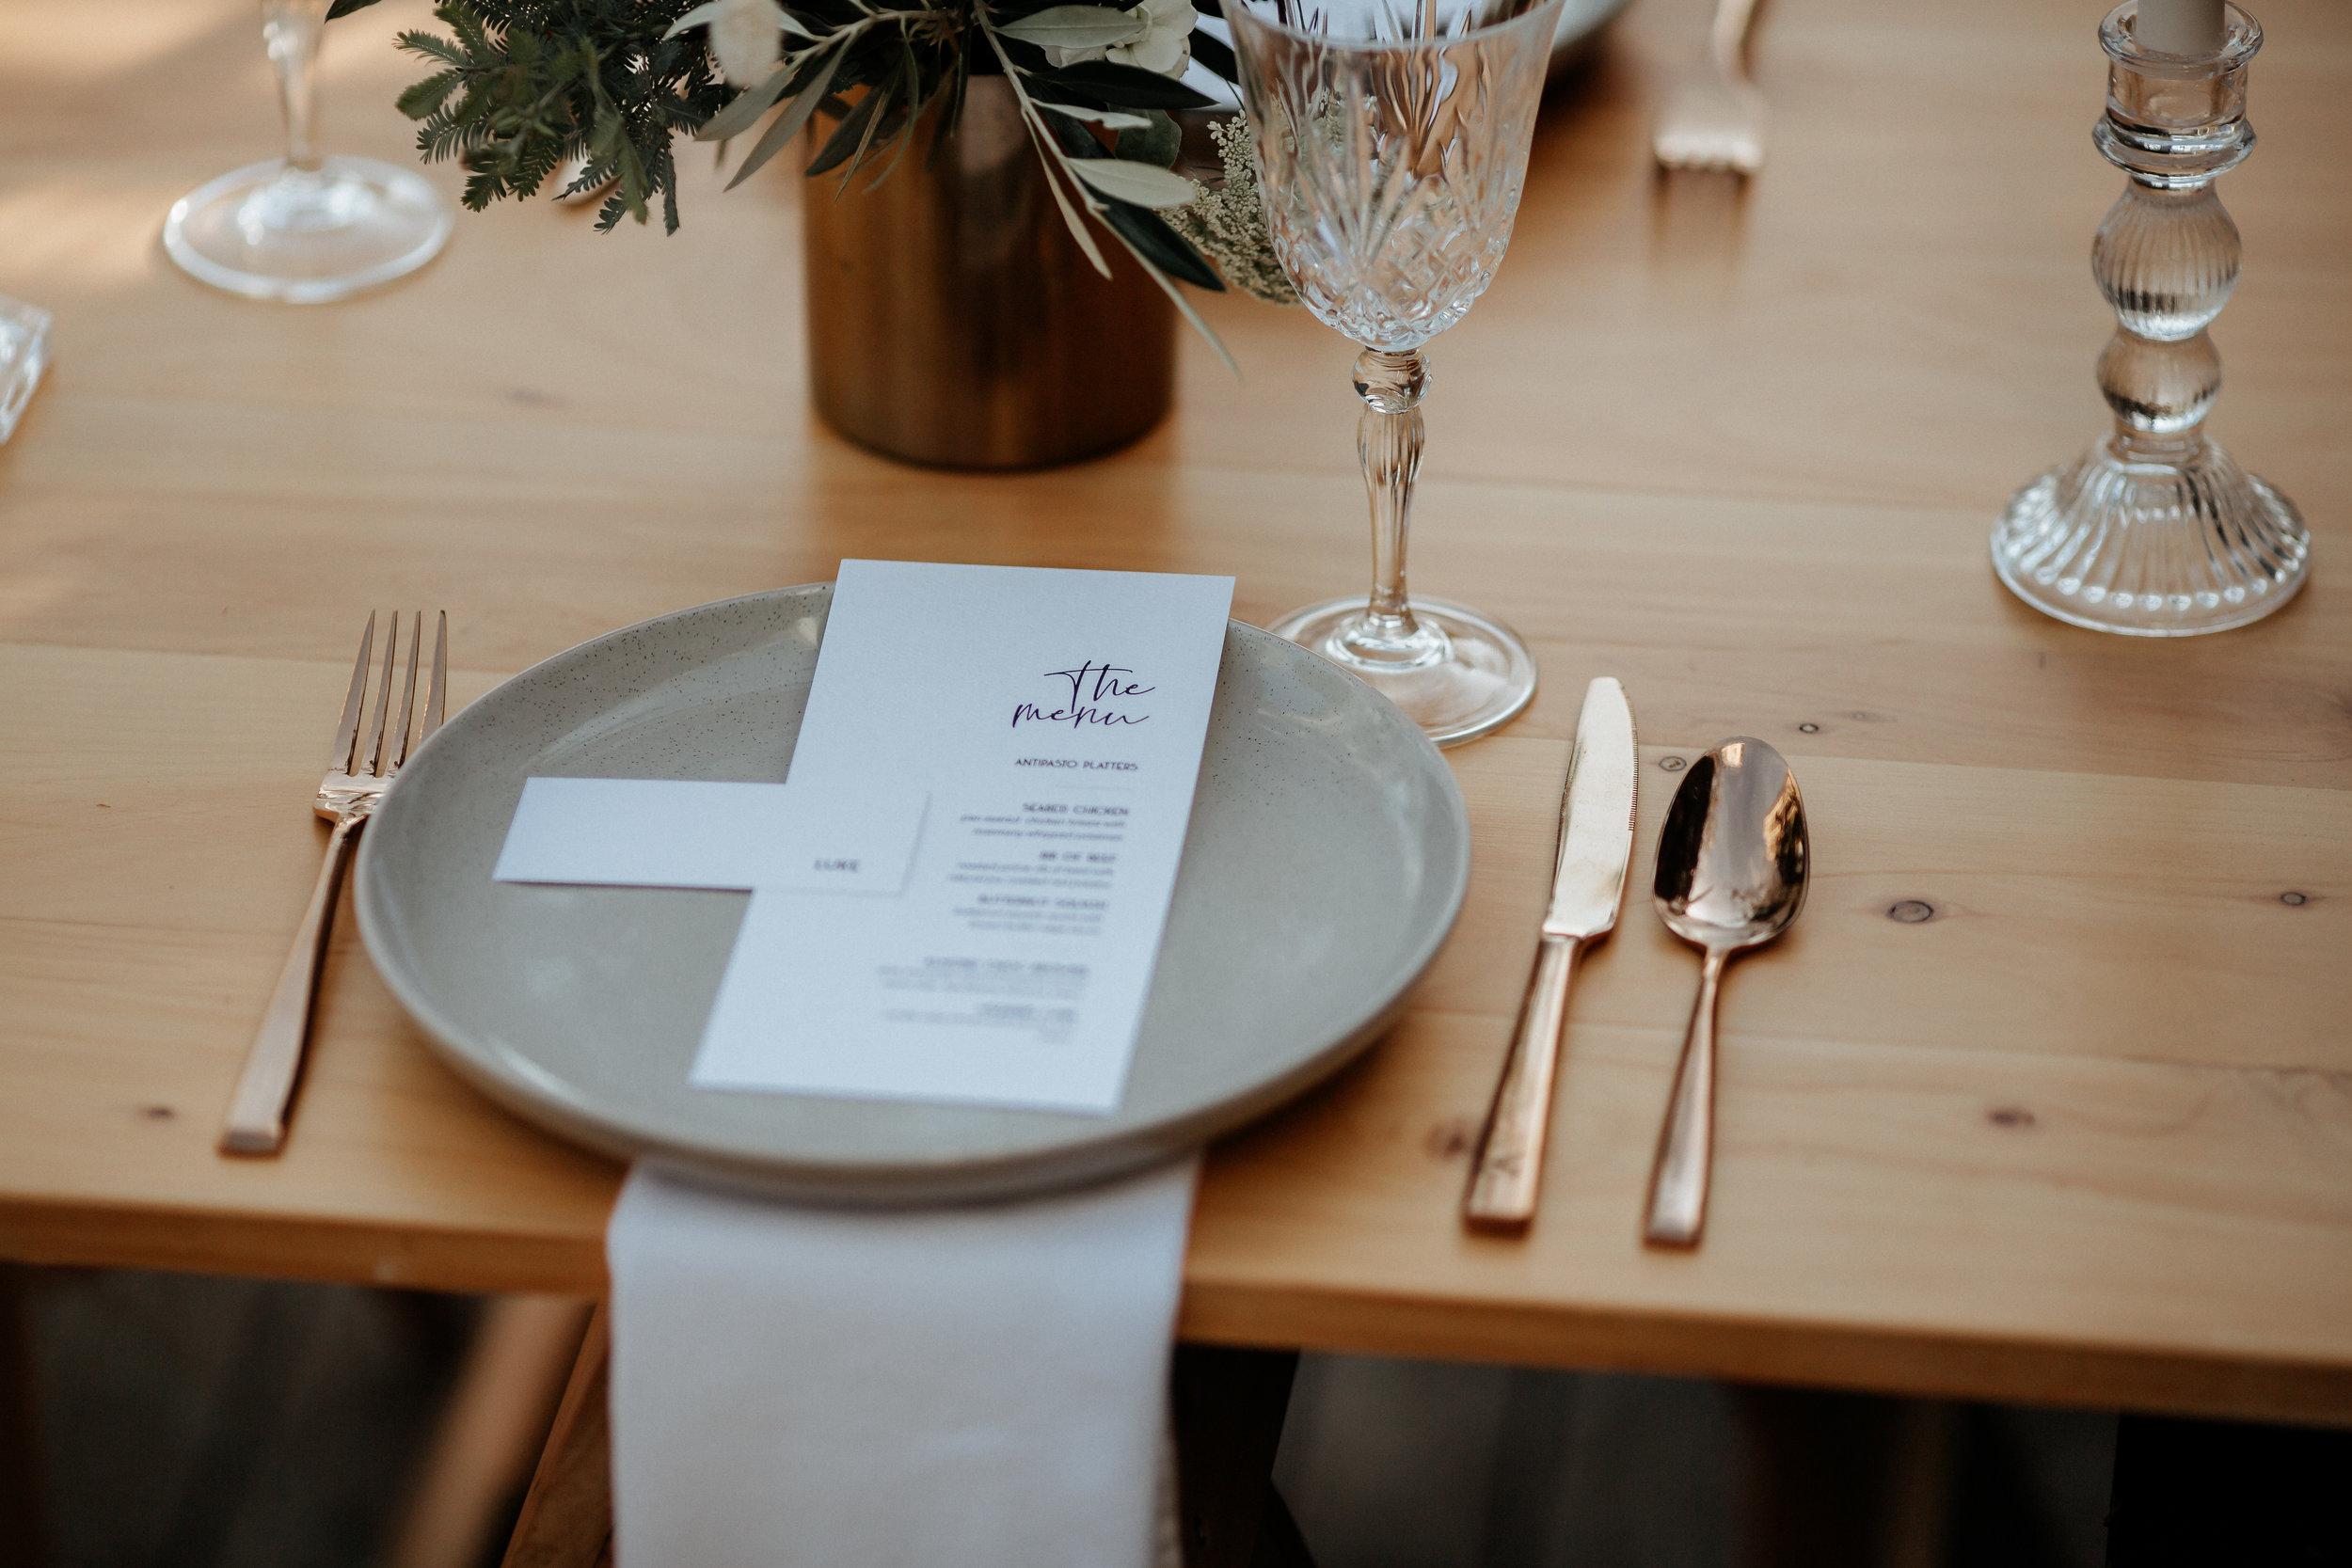 zandaphotography_Boheme_events_wedding_Auckland-246.jpg